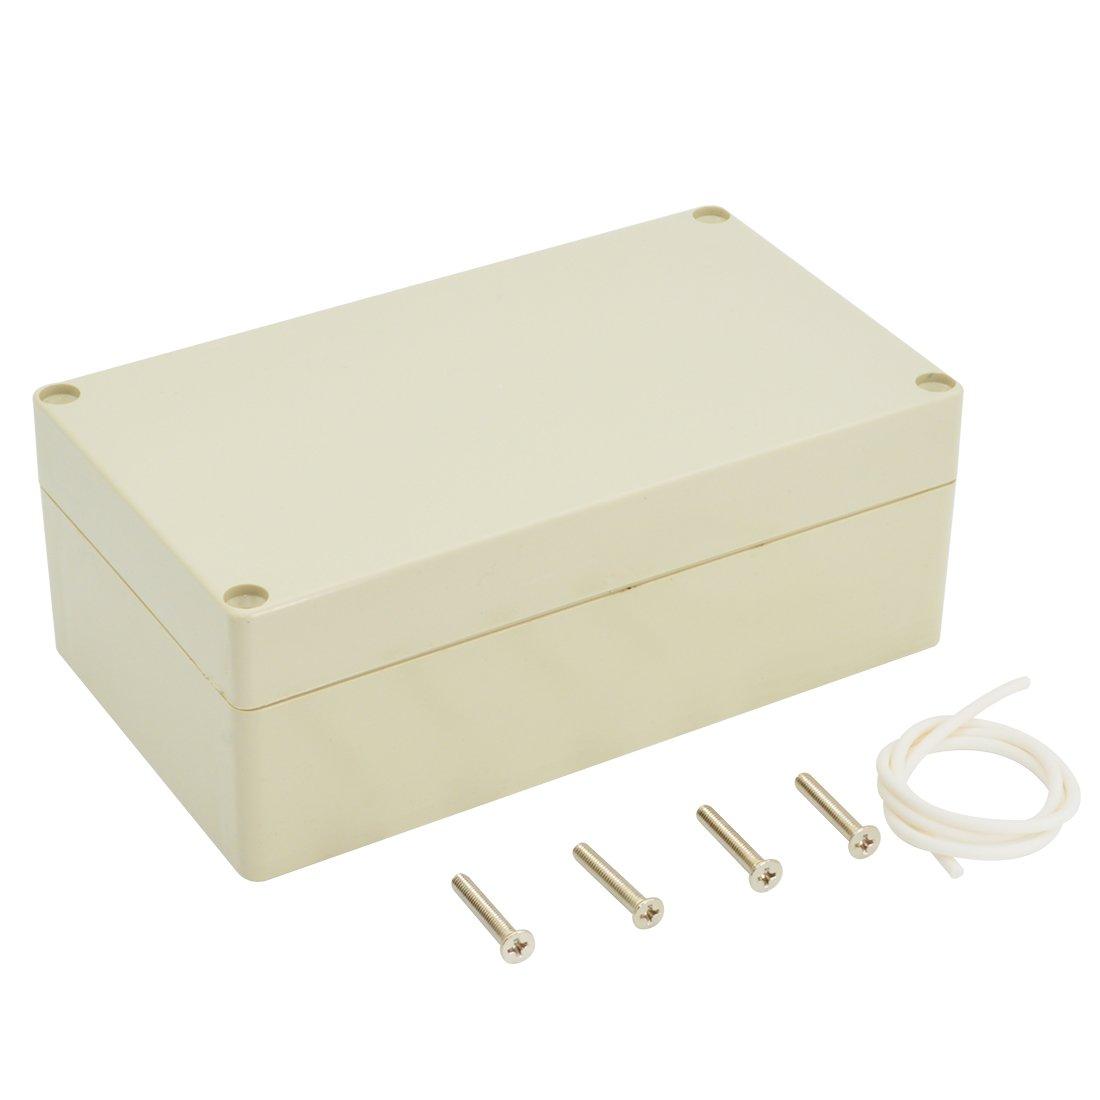 LeMotech Waterproof Dustproof IP65 ABS Plastic Junction Box Universal Electric Project Enclosure Pale Gray 6.2 x 3.54 x 2.3 inch 158 x 90 x 60 mm